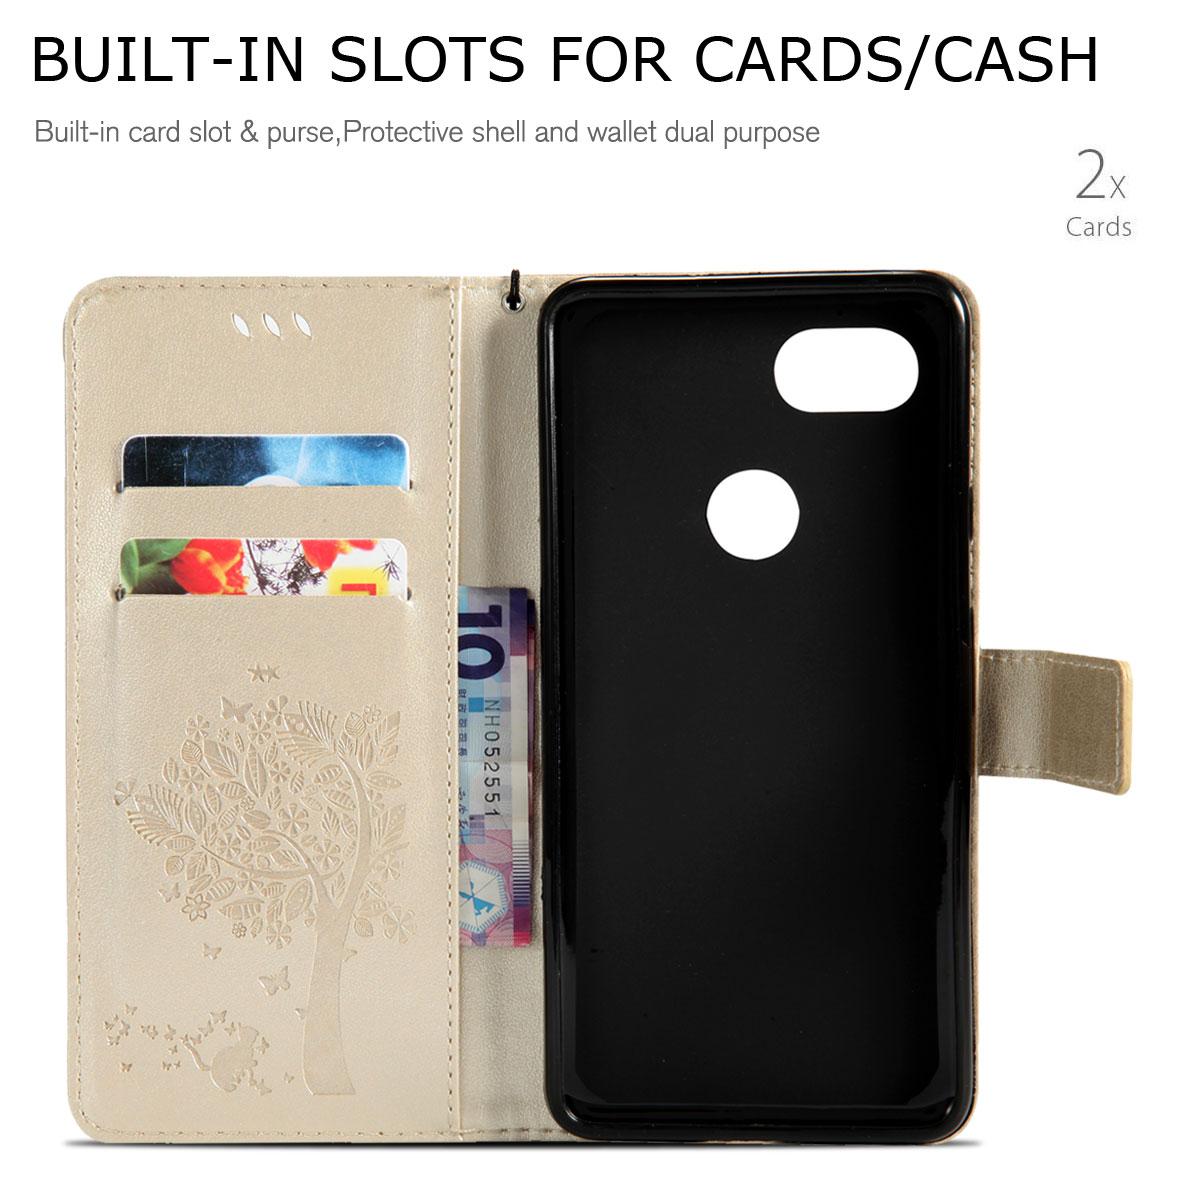 Magnetic-Leather-Credit-Card-Holder-Flip-Case-Cover-For-Google-Pixel-2-2-XL thumbnail 48